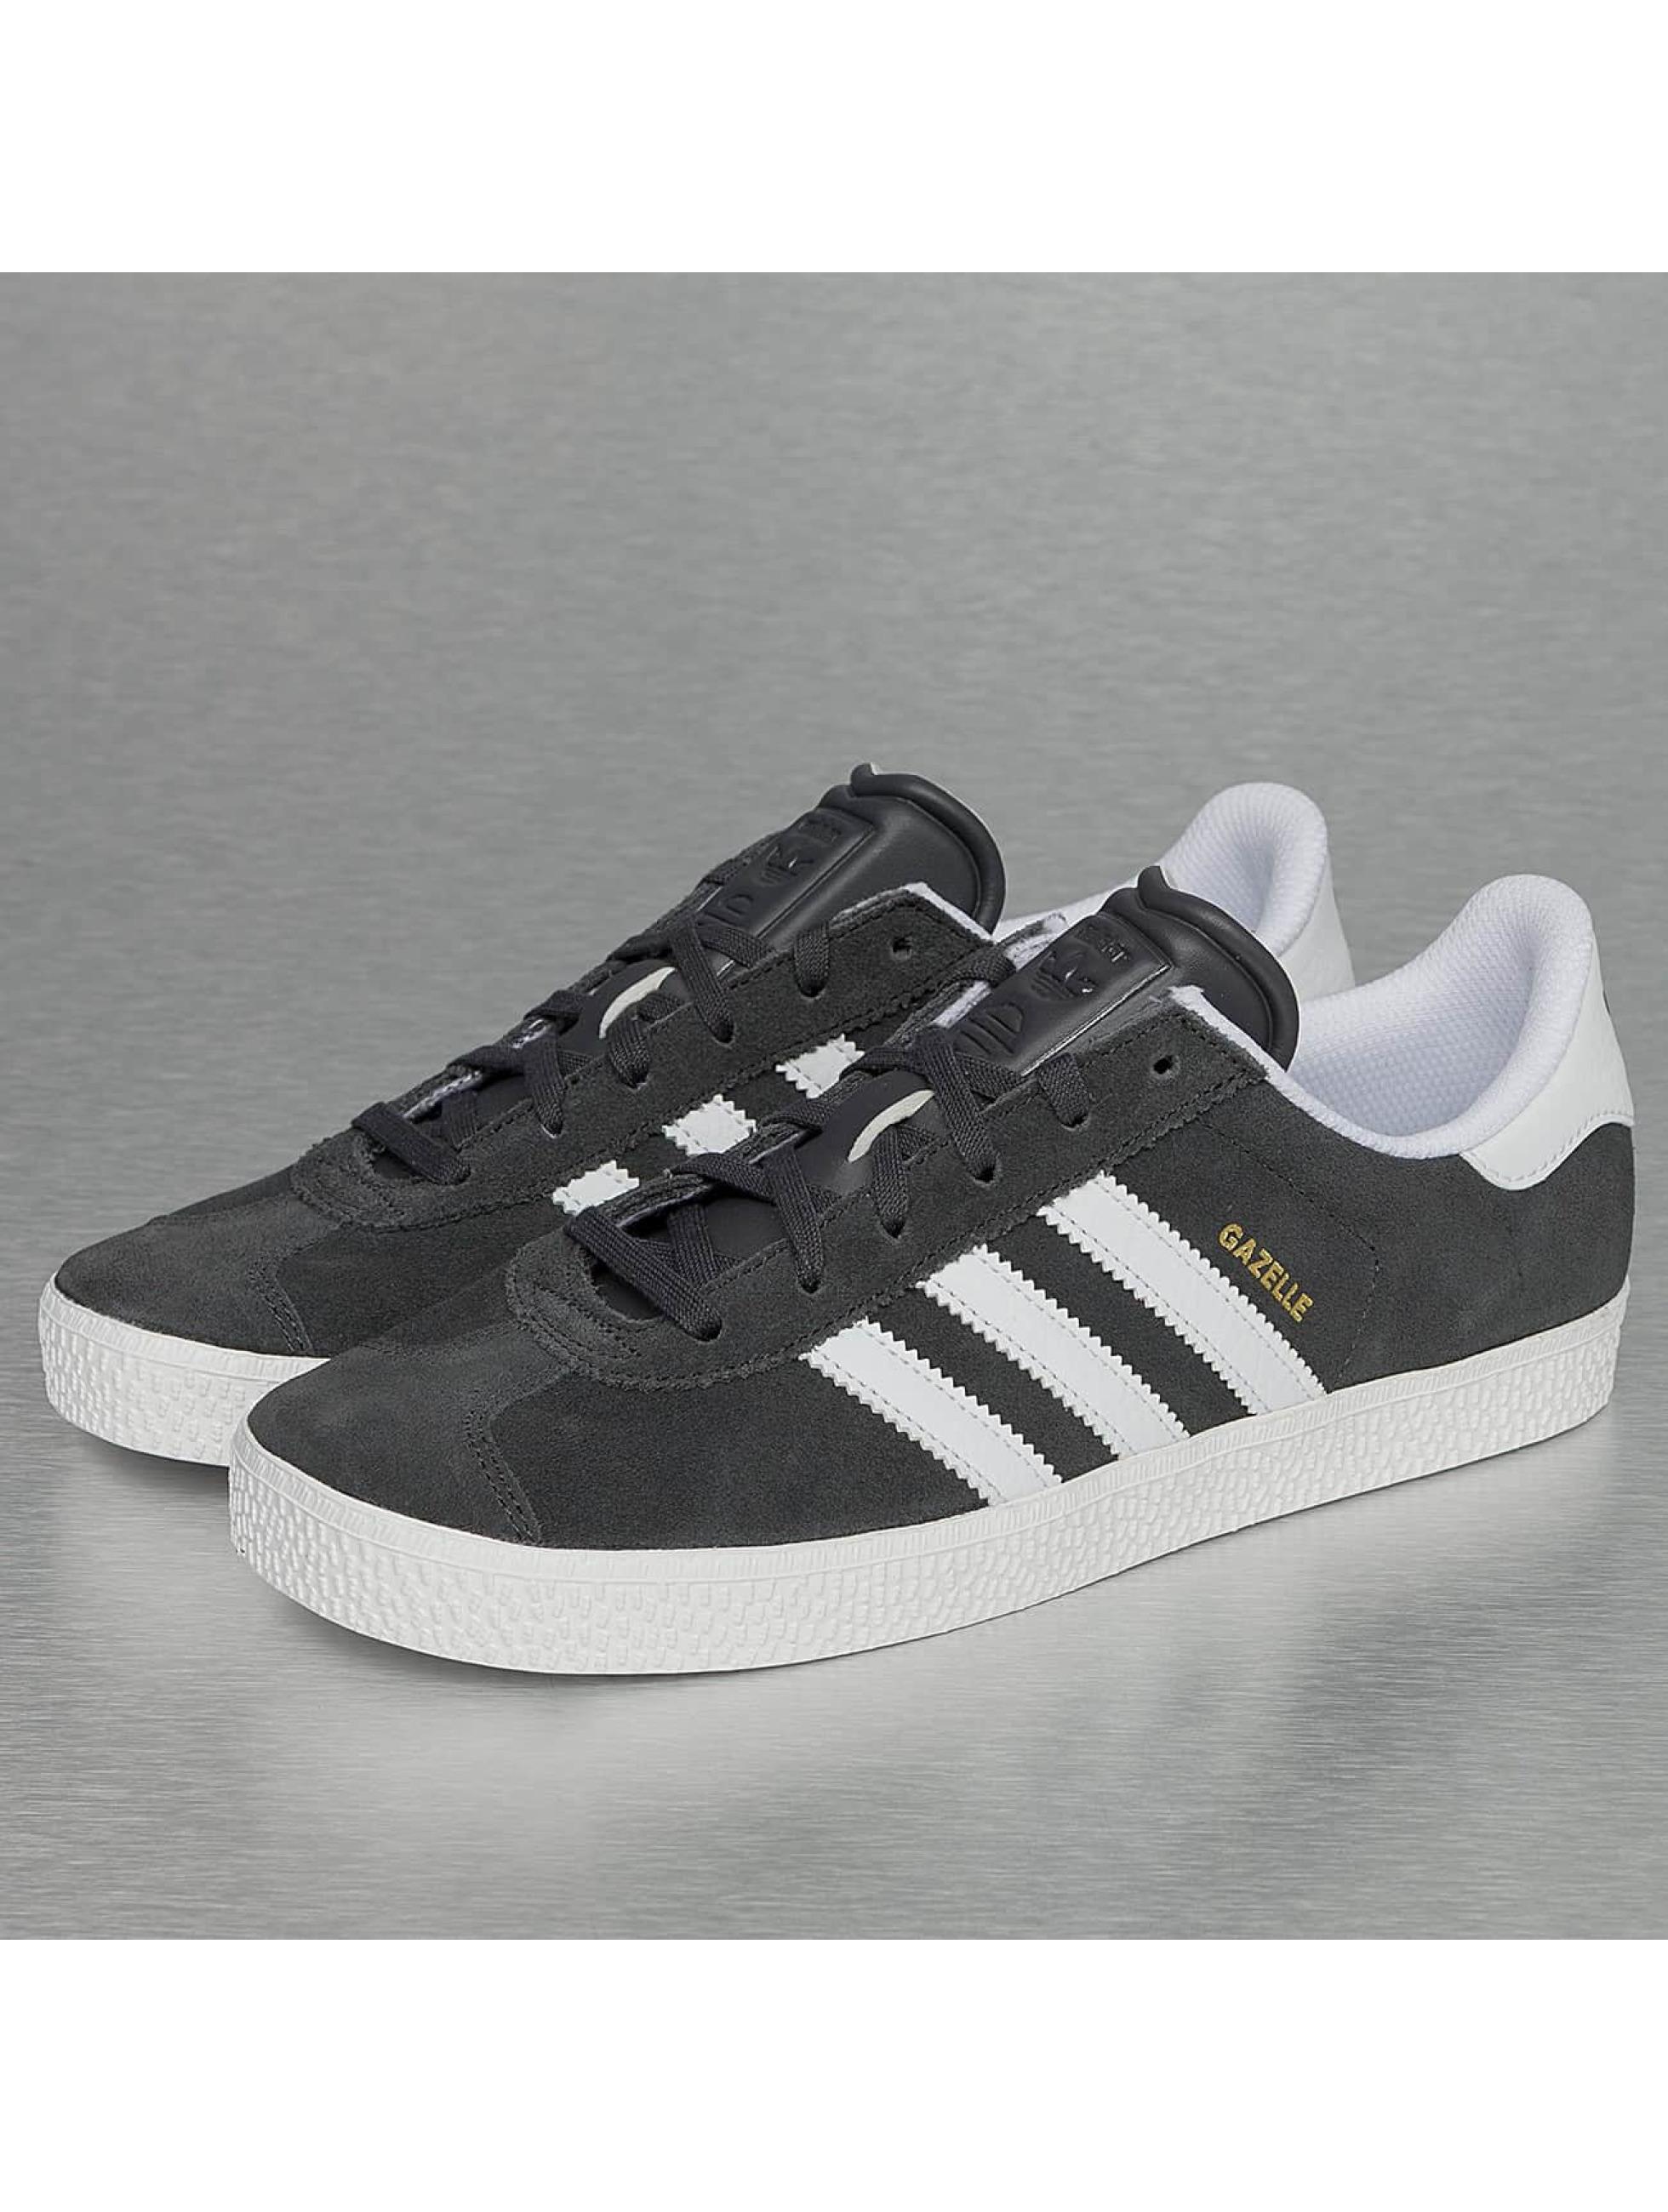 adidas Chaussures / Baskets Gazelle 2 en gris